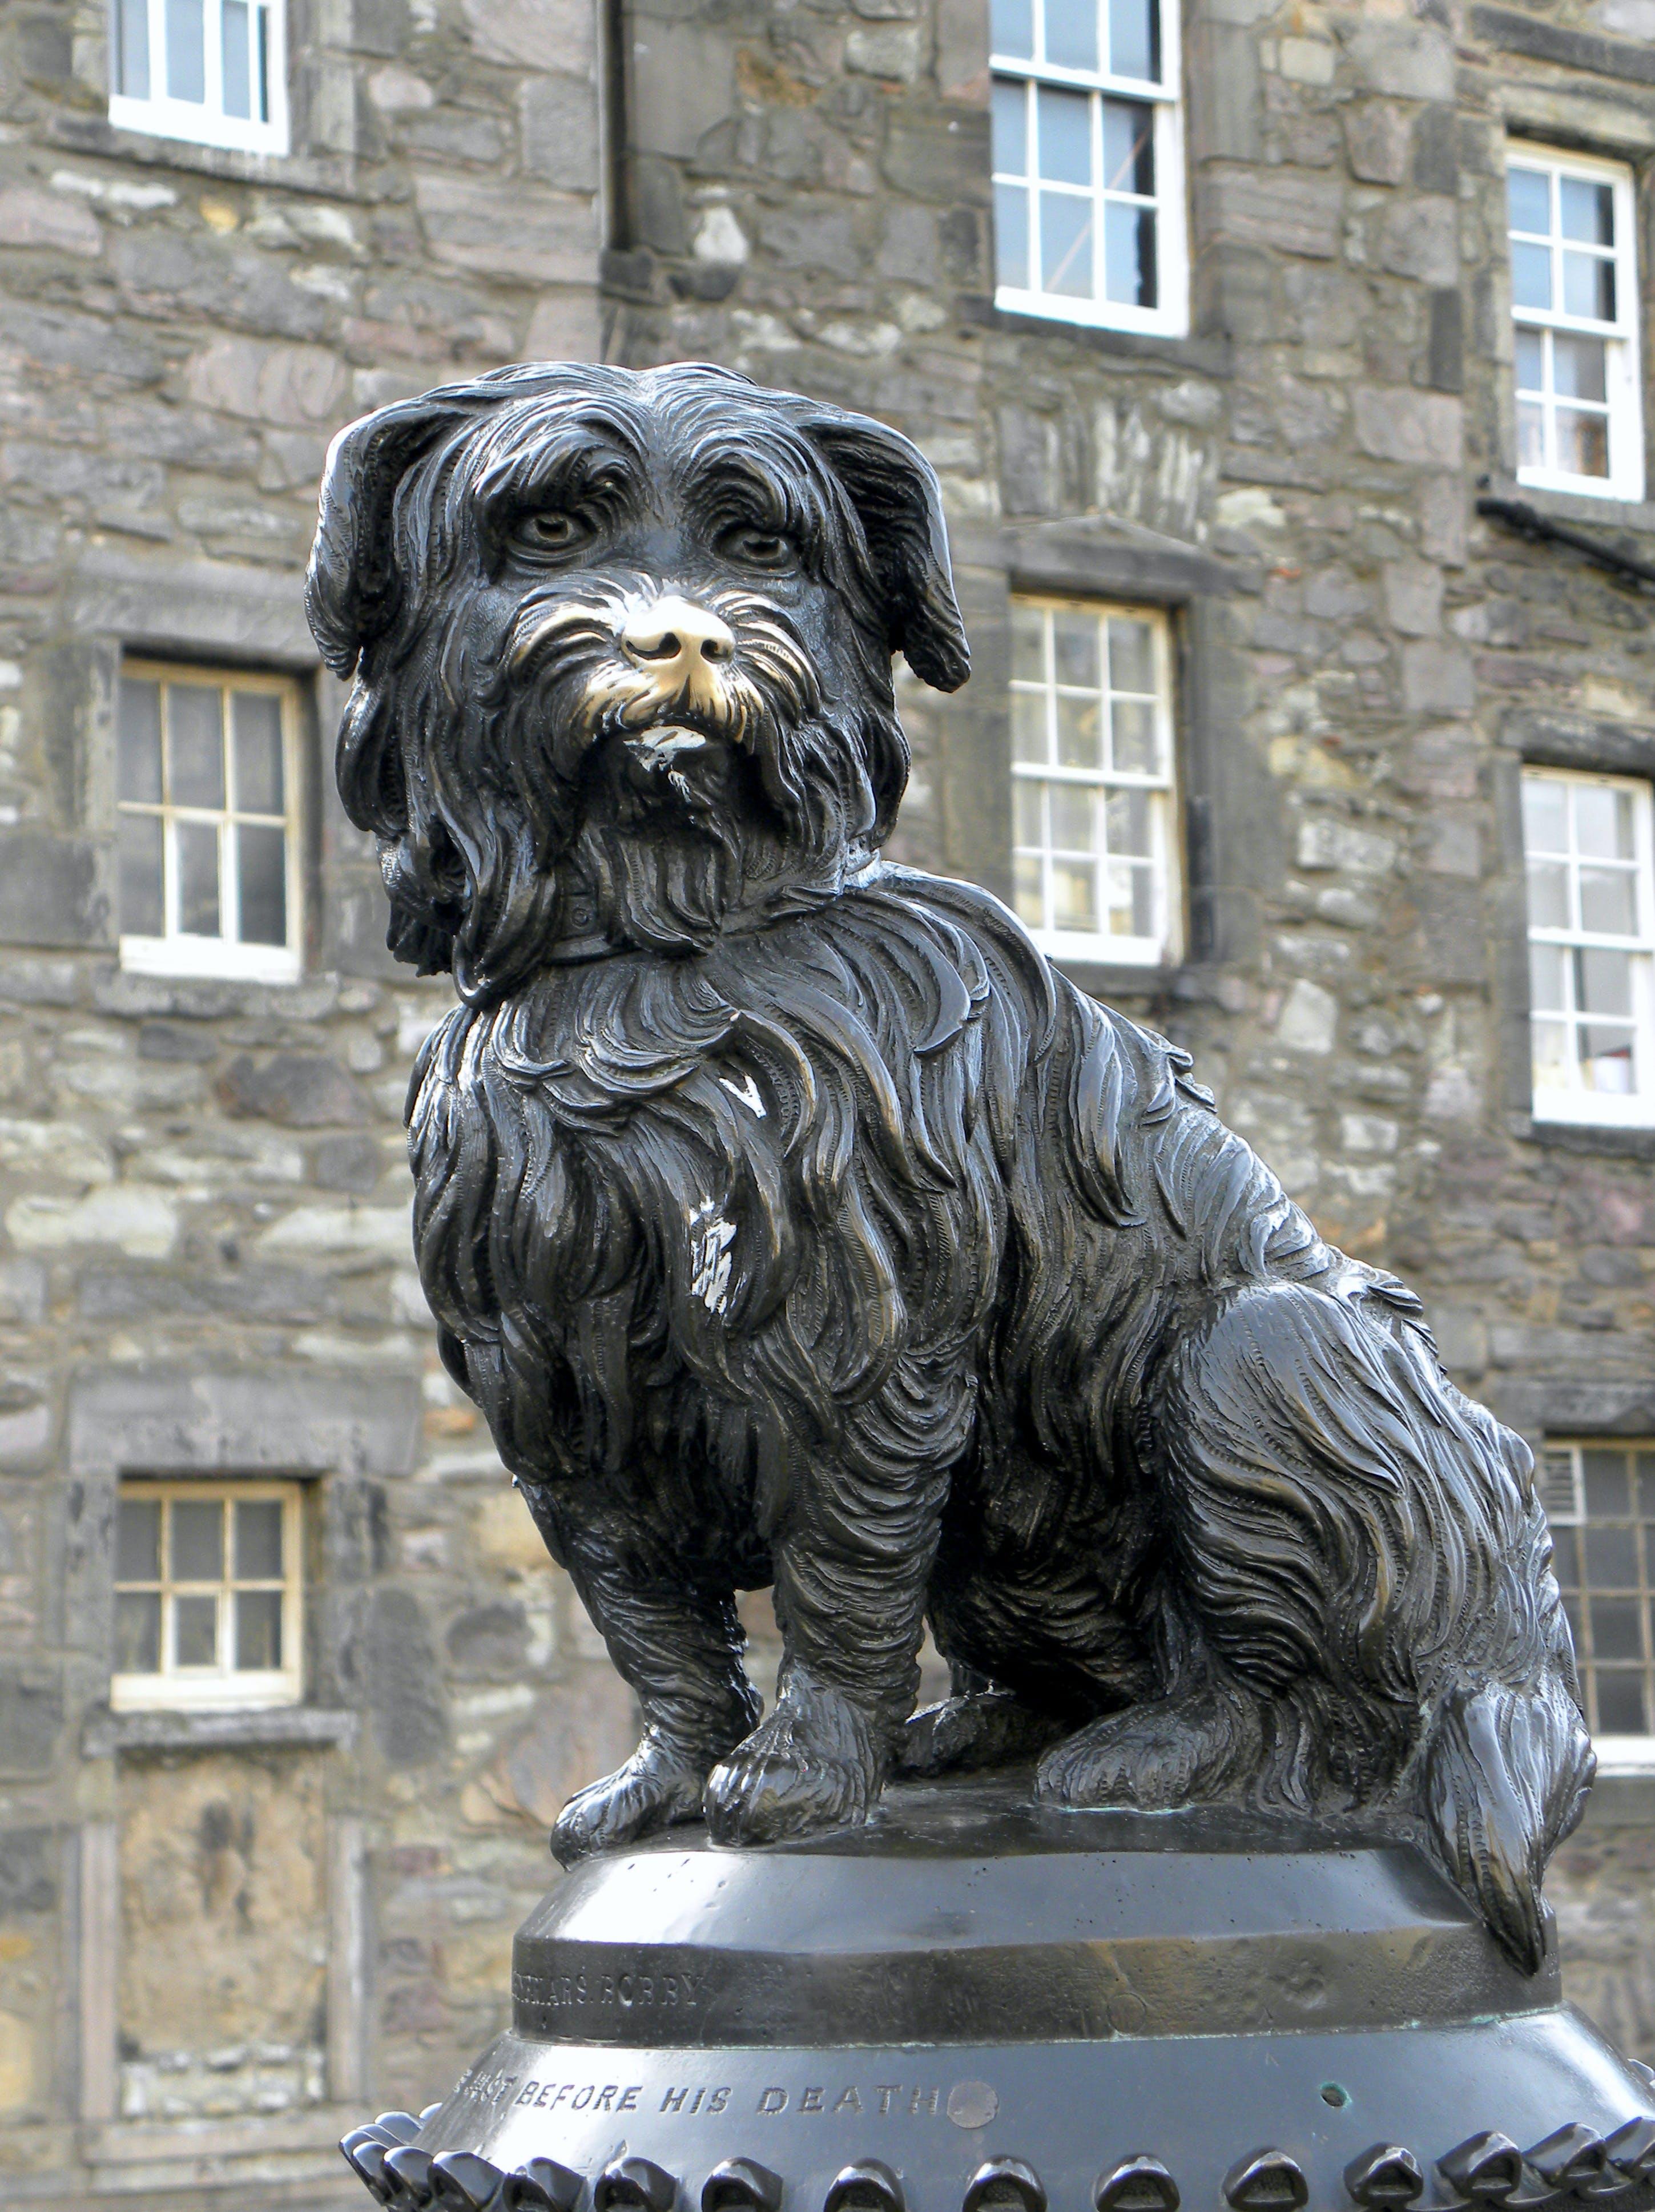 Kostenloses Stock Foto zu denkmal, edinburgh, hund, skulptur